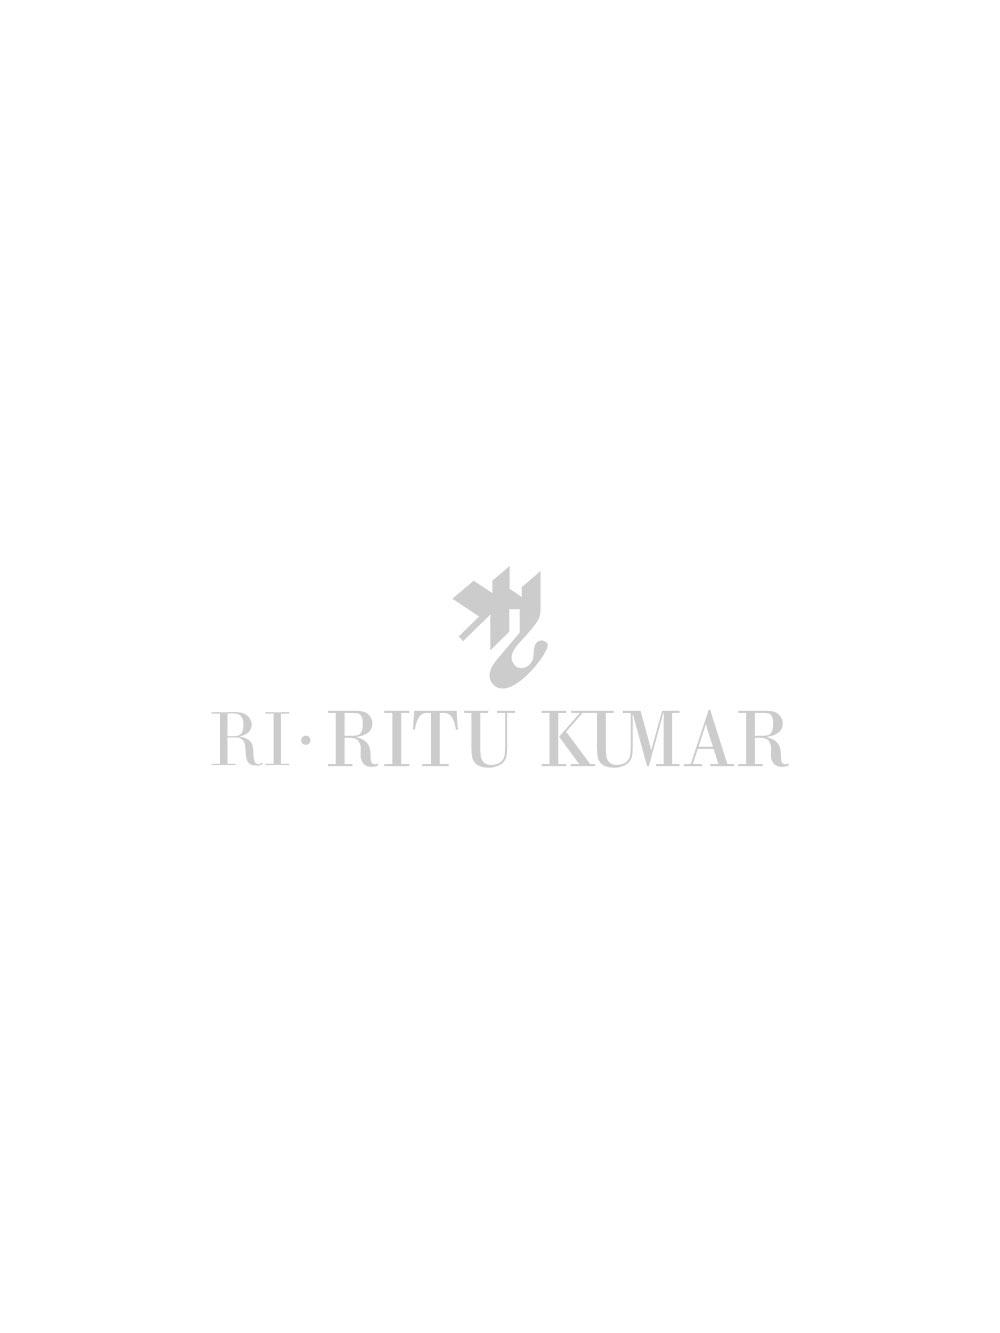 Khaki & Off White Embroidered Kurta With Dupatta And Churidar